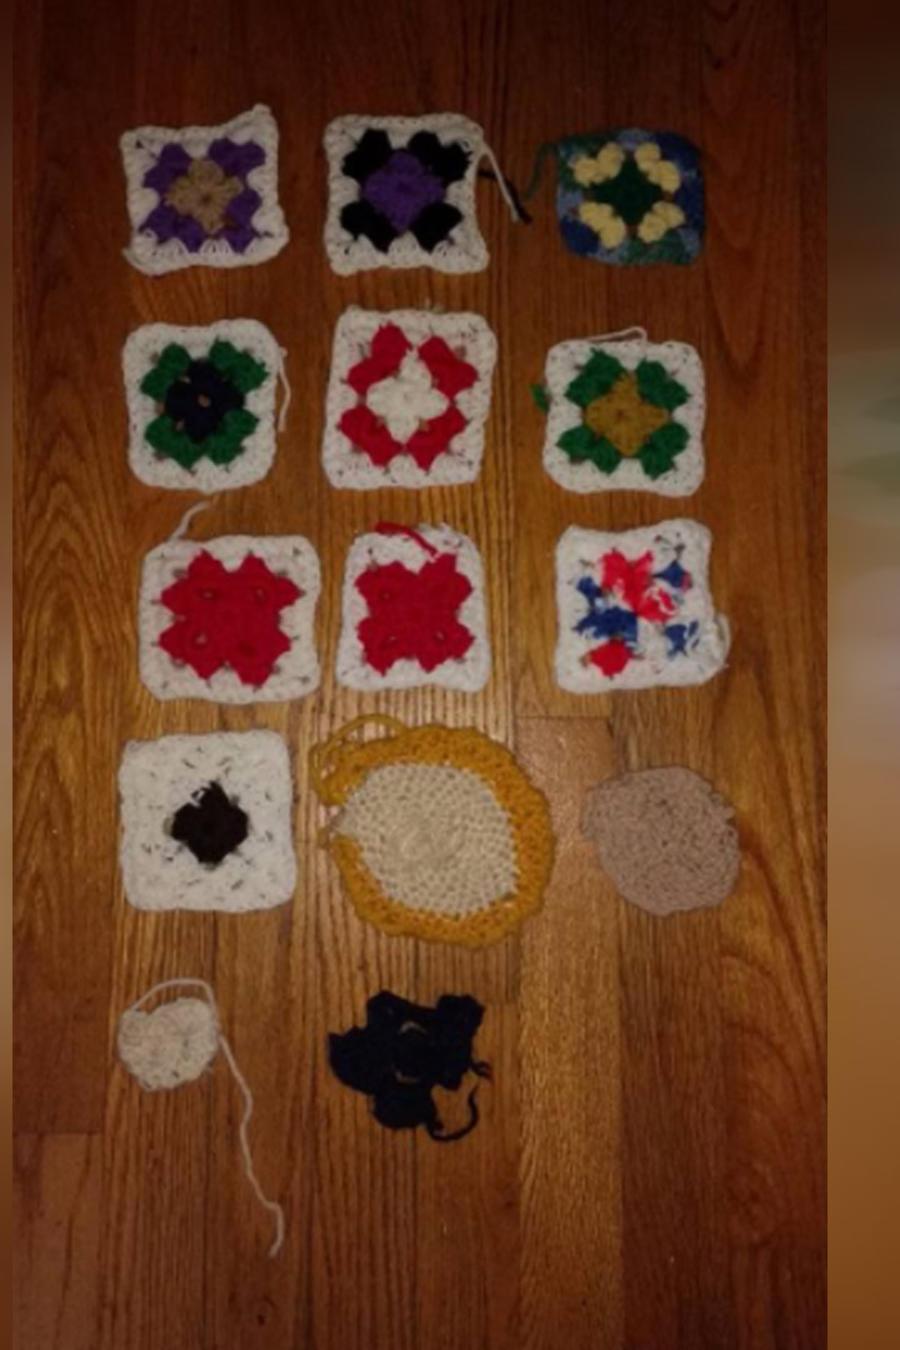 Tejidos a crochet de una mujer con Alzheimer